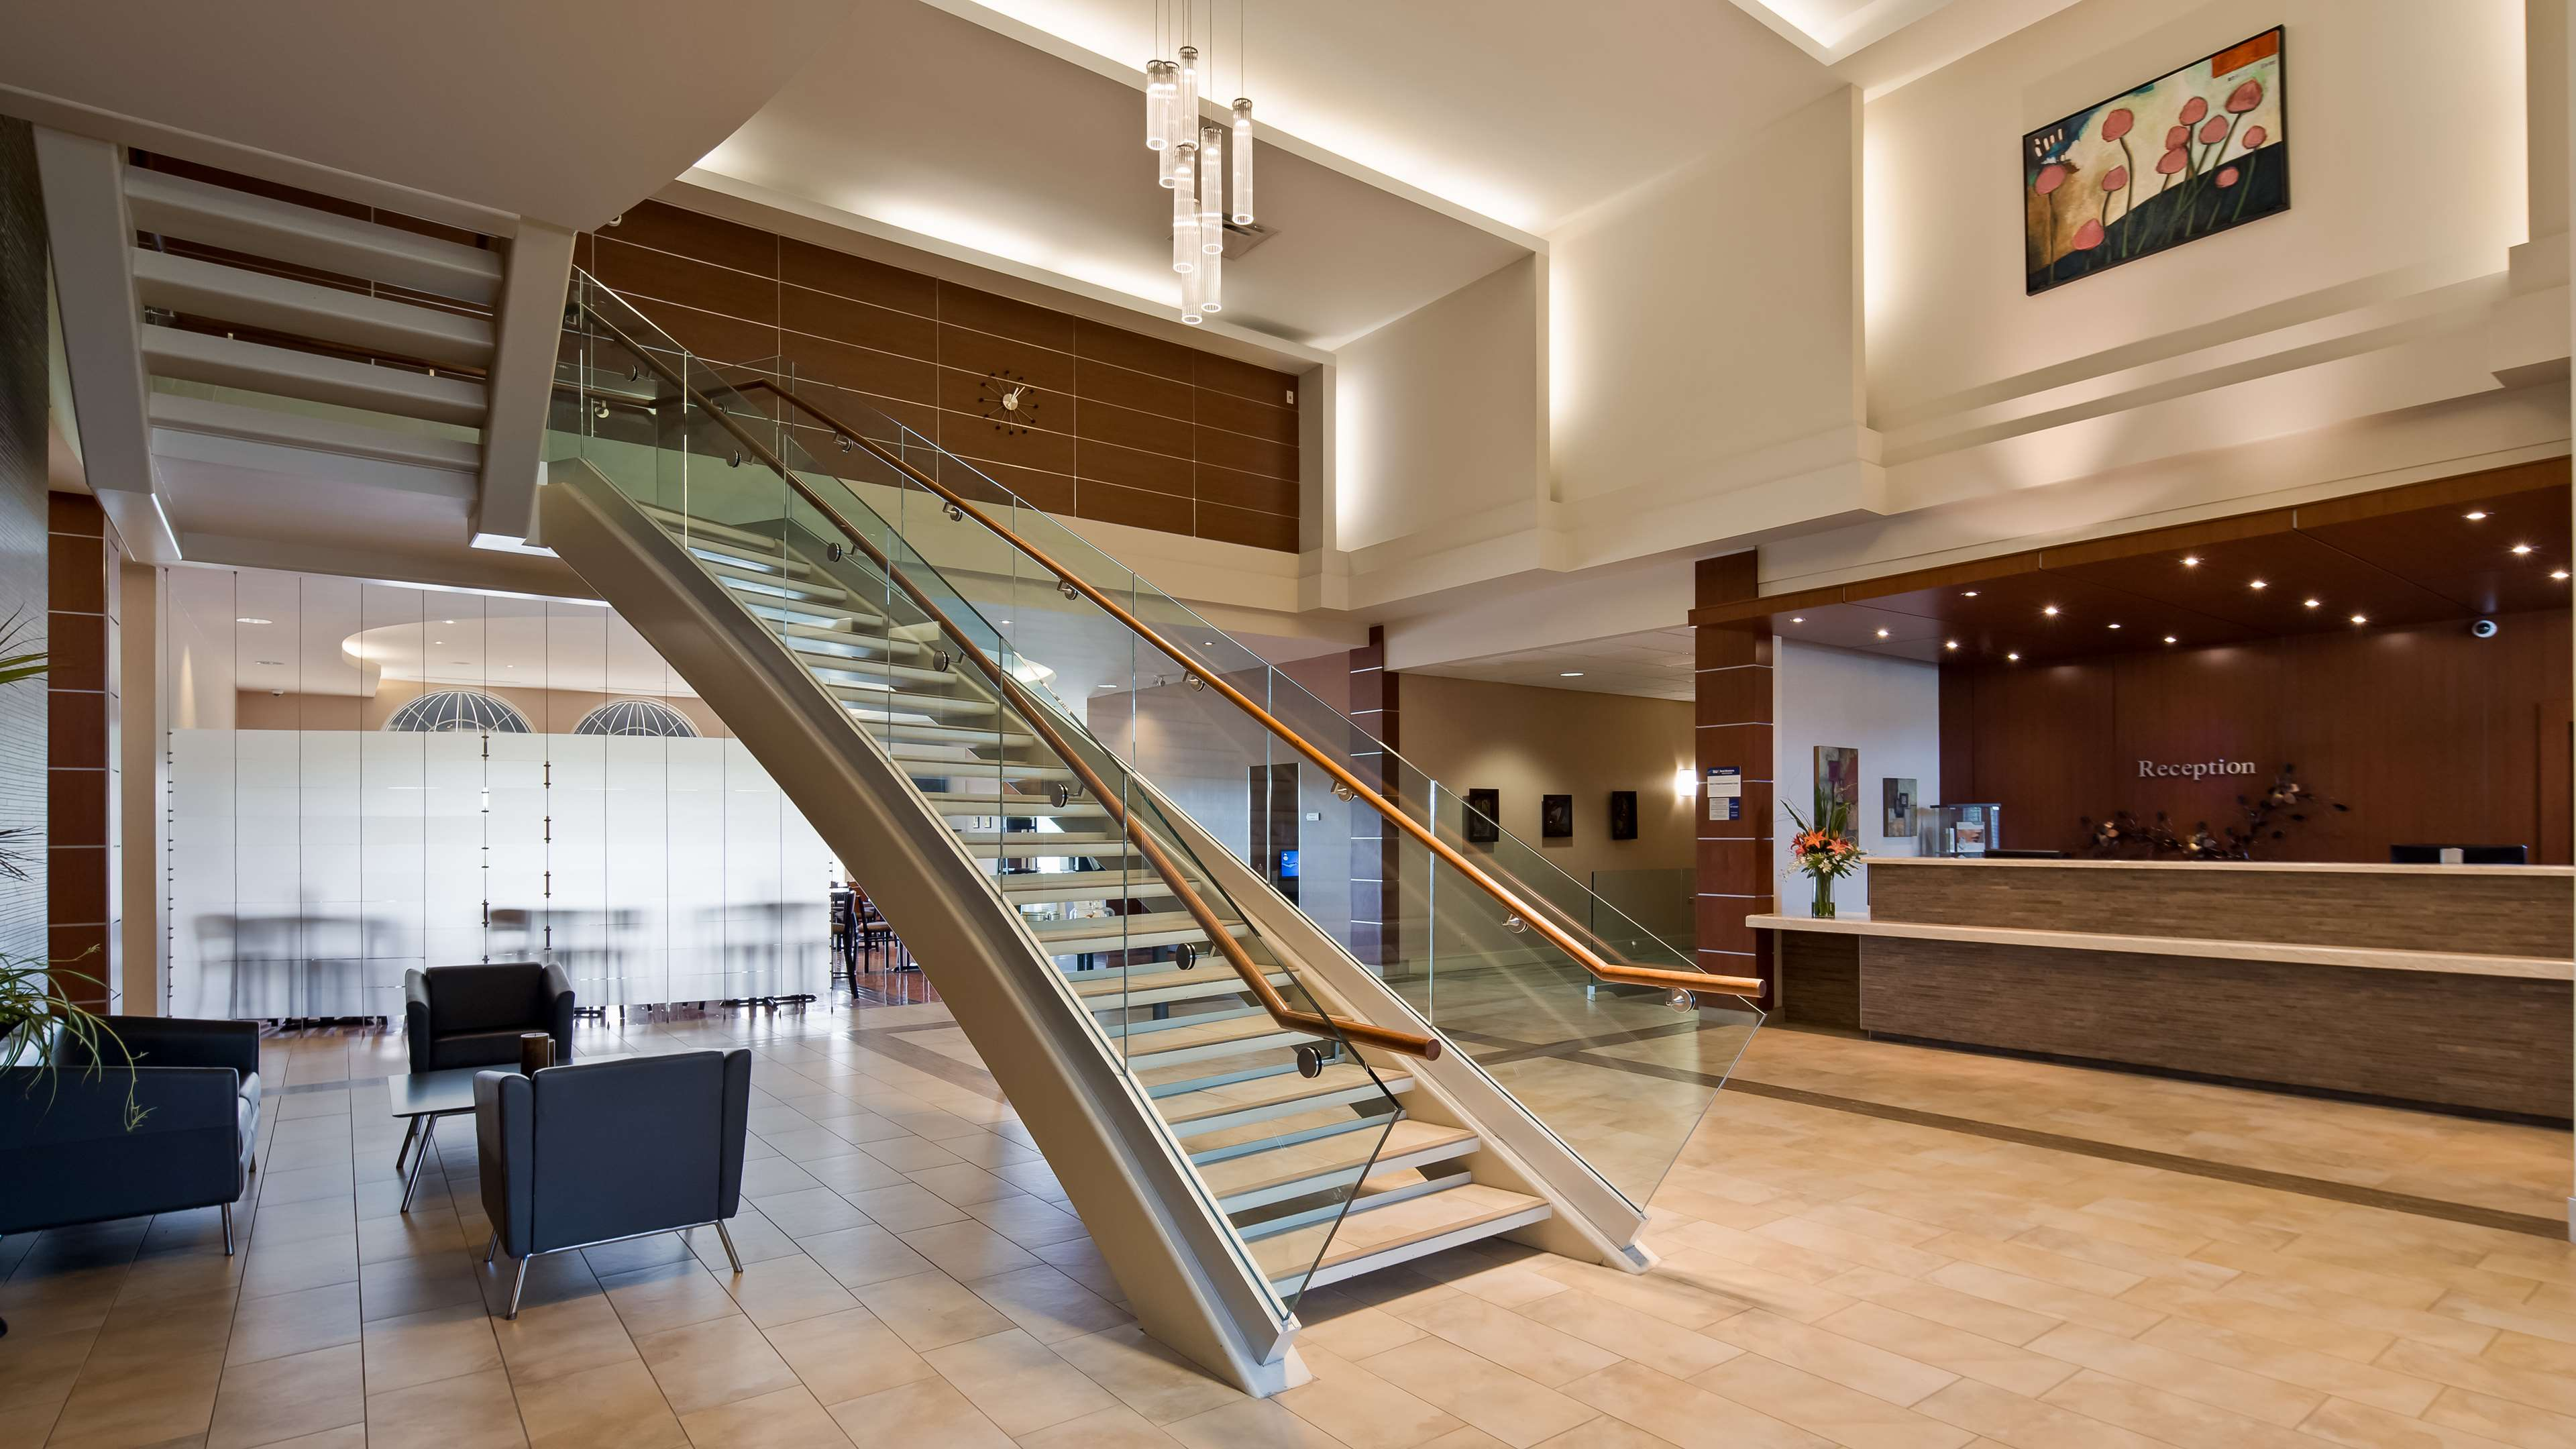 Hotel Lobby Best Western Plus Orangeville Inn & Suites Orangeville (519)941-3311